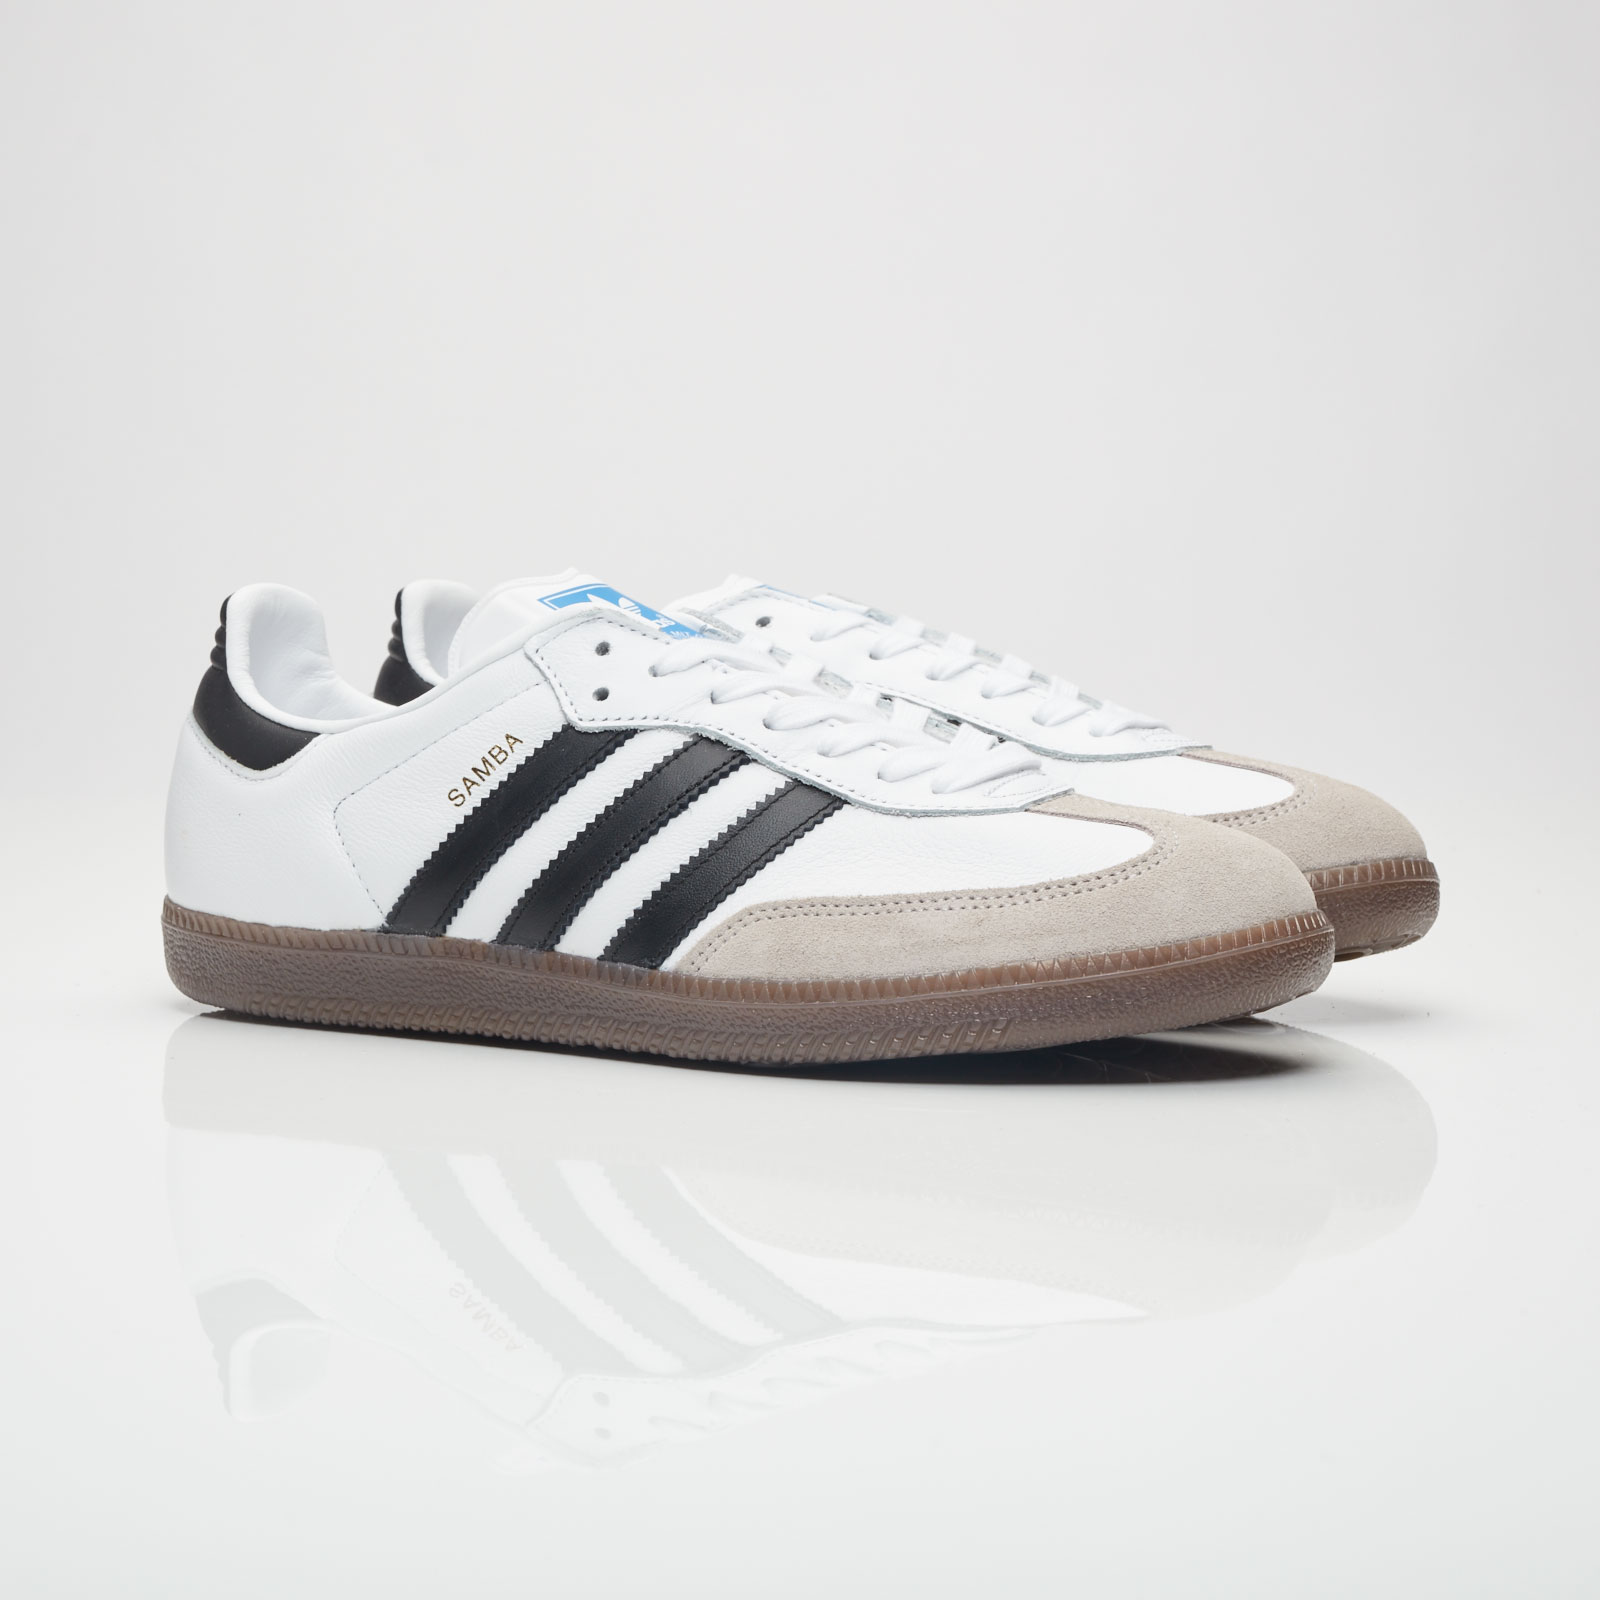 Adidas Samba og bb2588 sneakersnstuff zapatilla & Streetwear